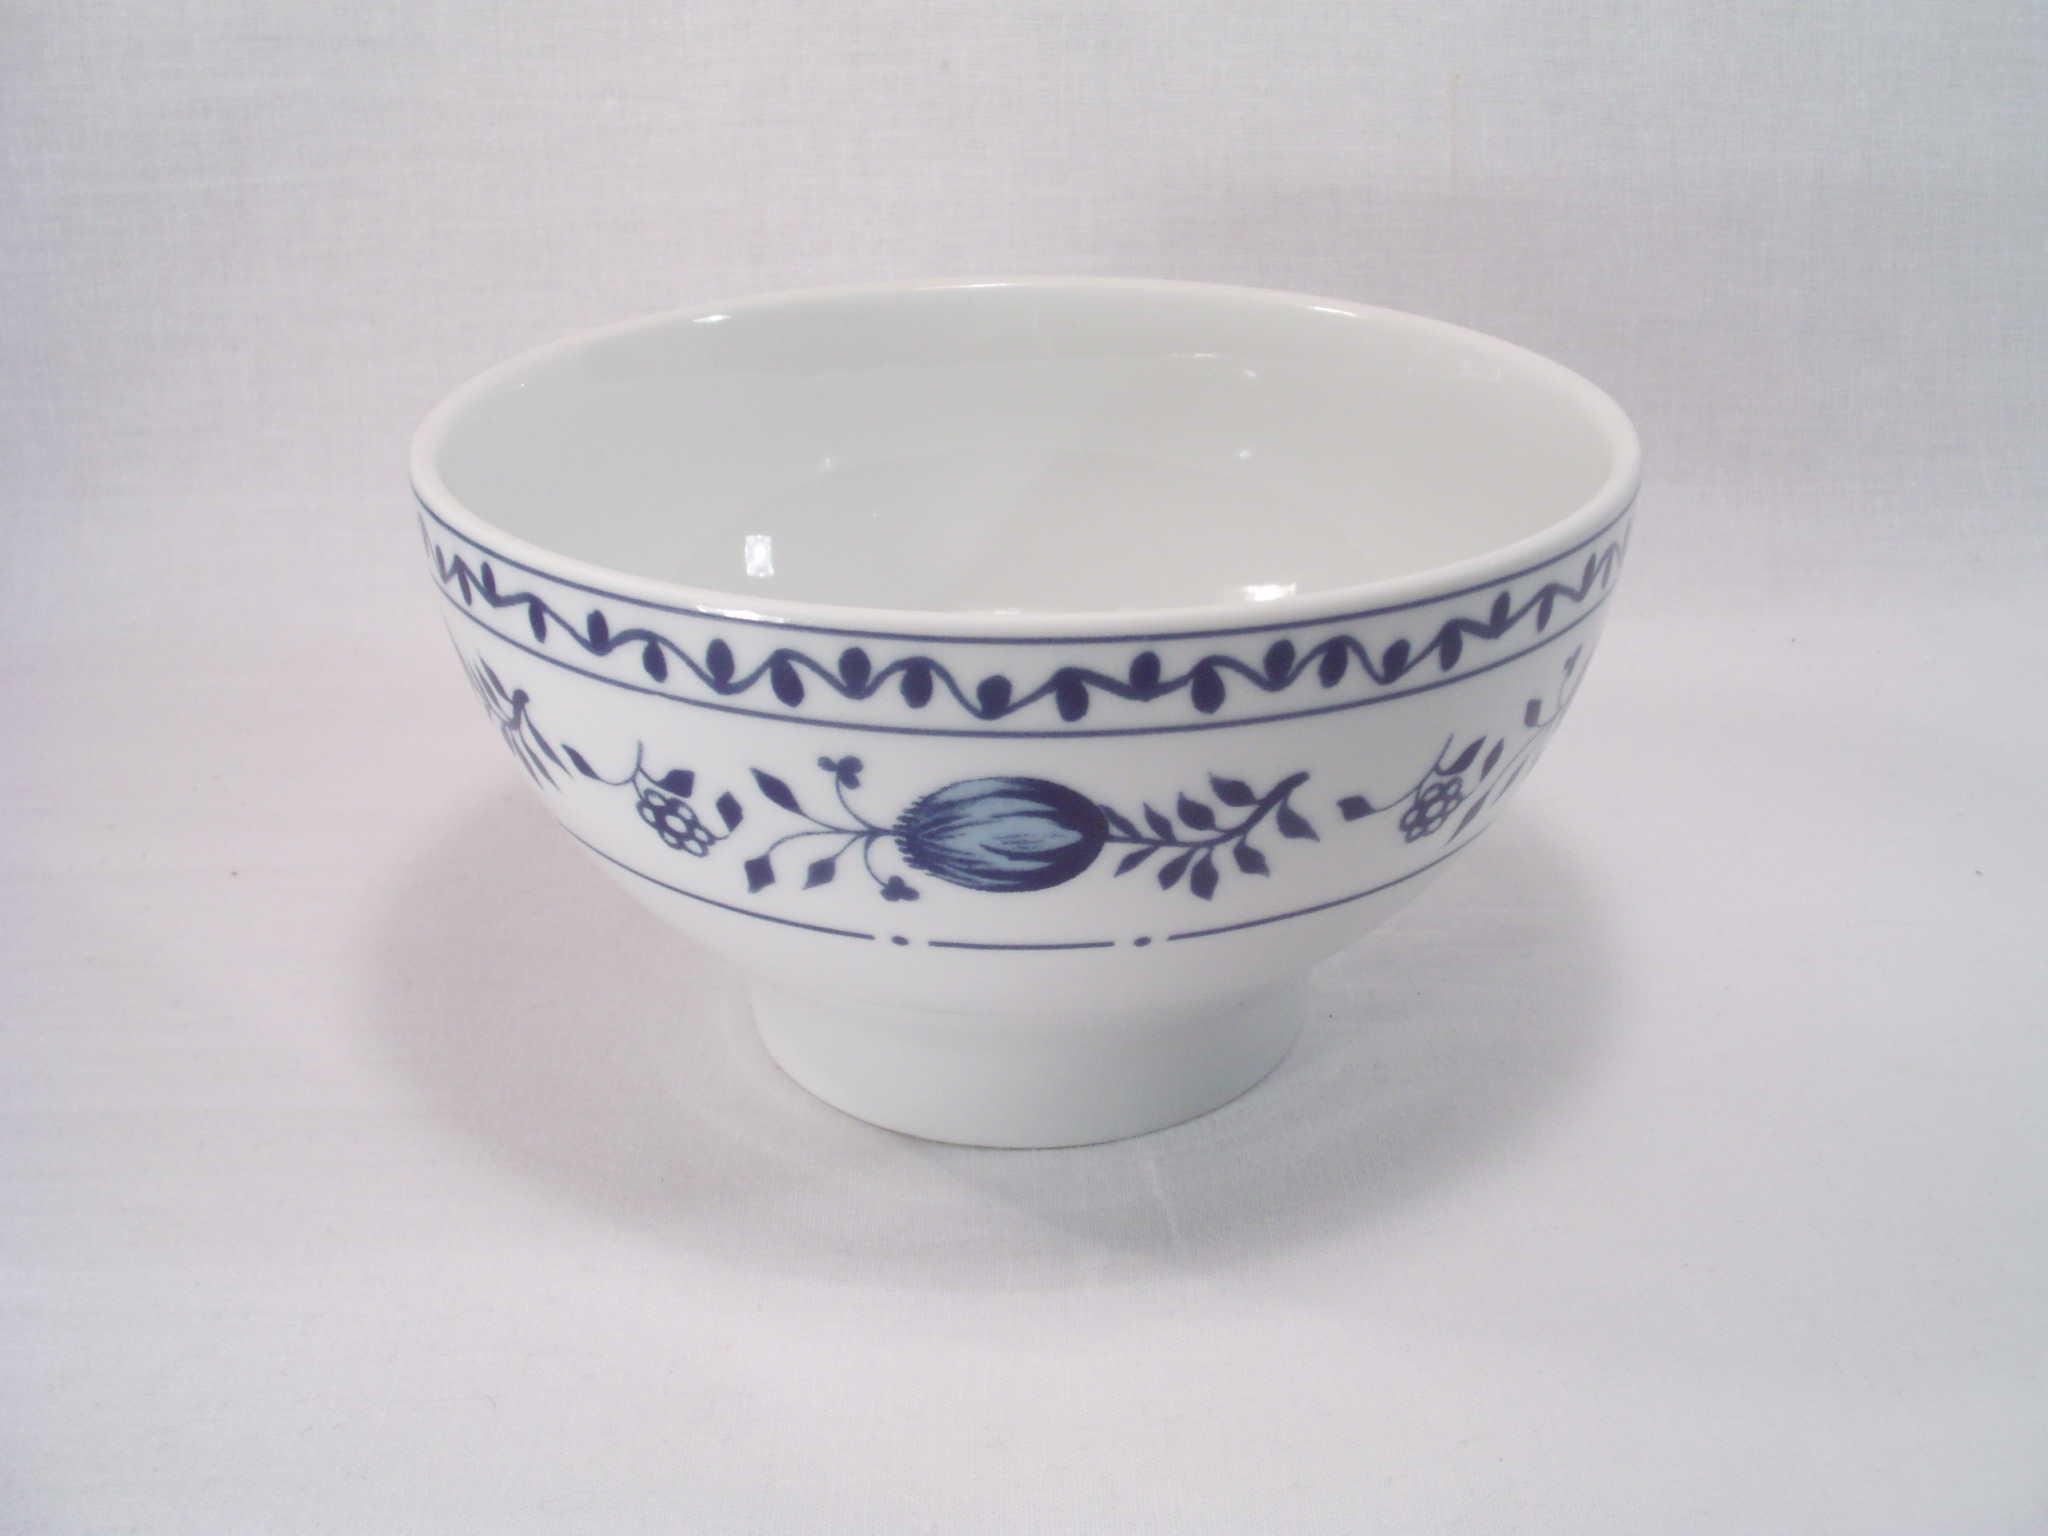 sch ssel bowl 14 cm kahla zwiebelmuster triptis. Black Bedroom Furniture Sets. Home Design Ideas